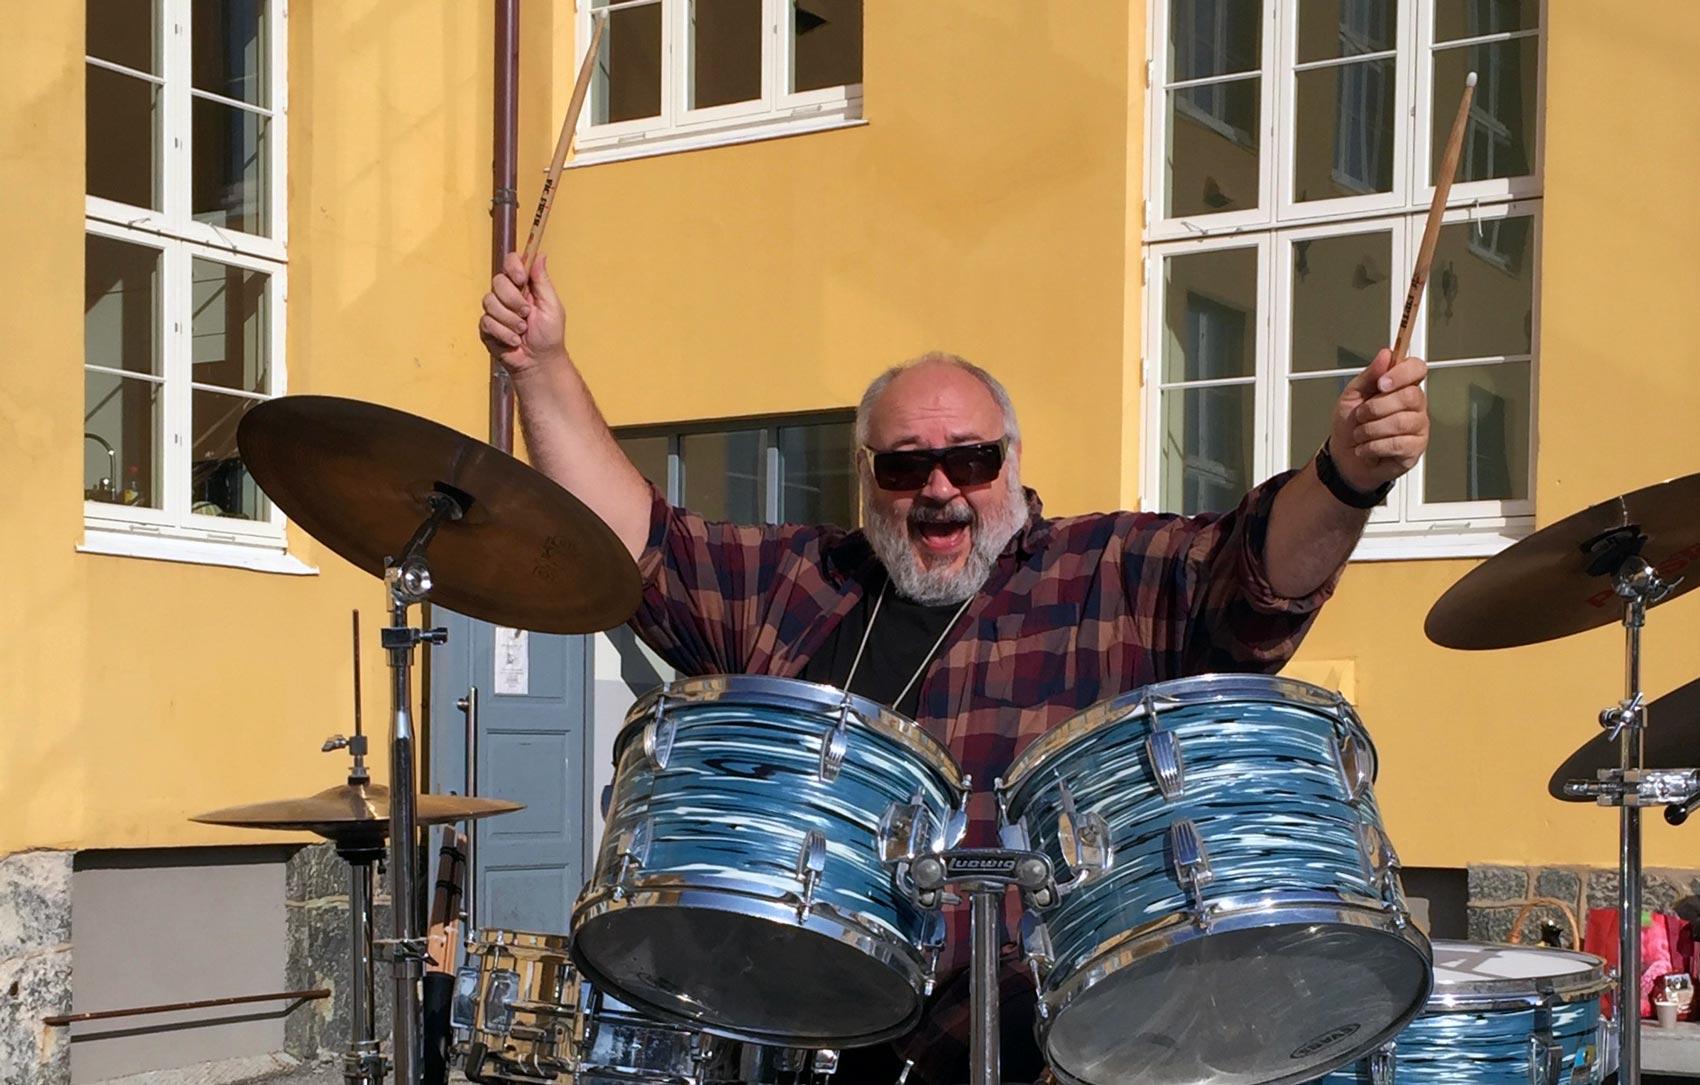 Voice-Of-Norway-Fortellerstemme-Jon-Henriksen-app-reiseguide-turistguide-audiovisuell-lydguide-voiceover-historieforteller-trommer